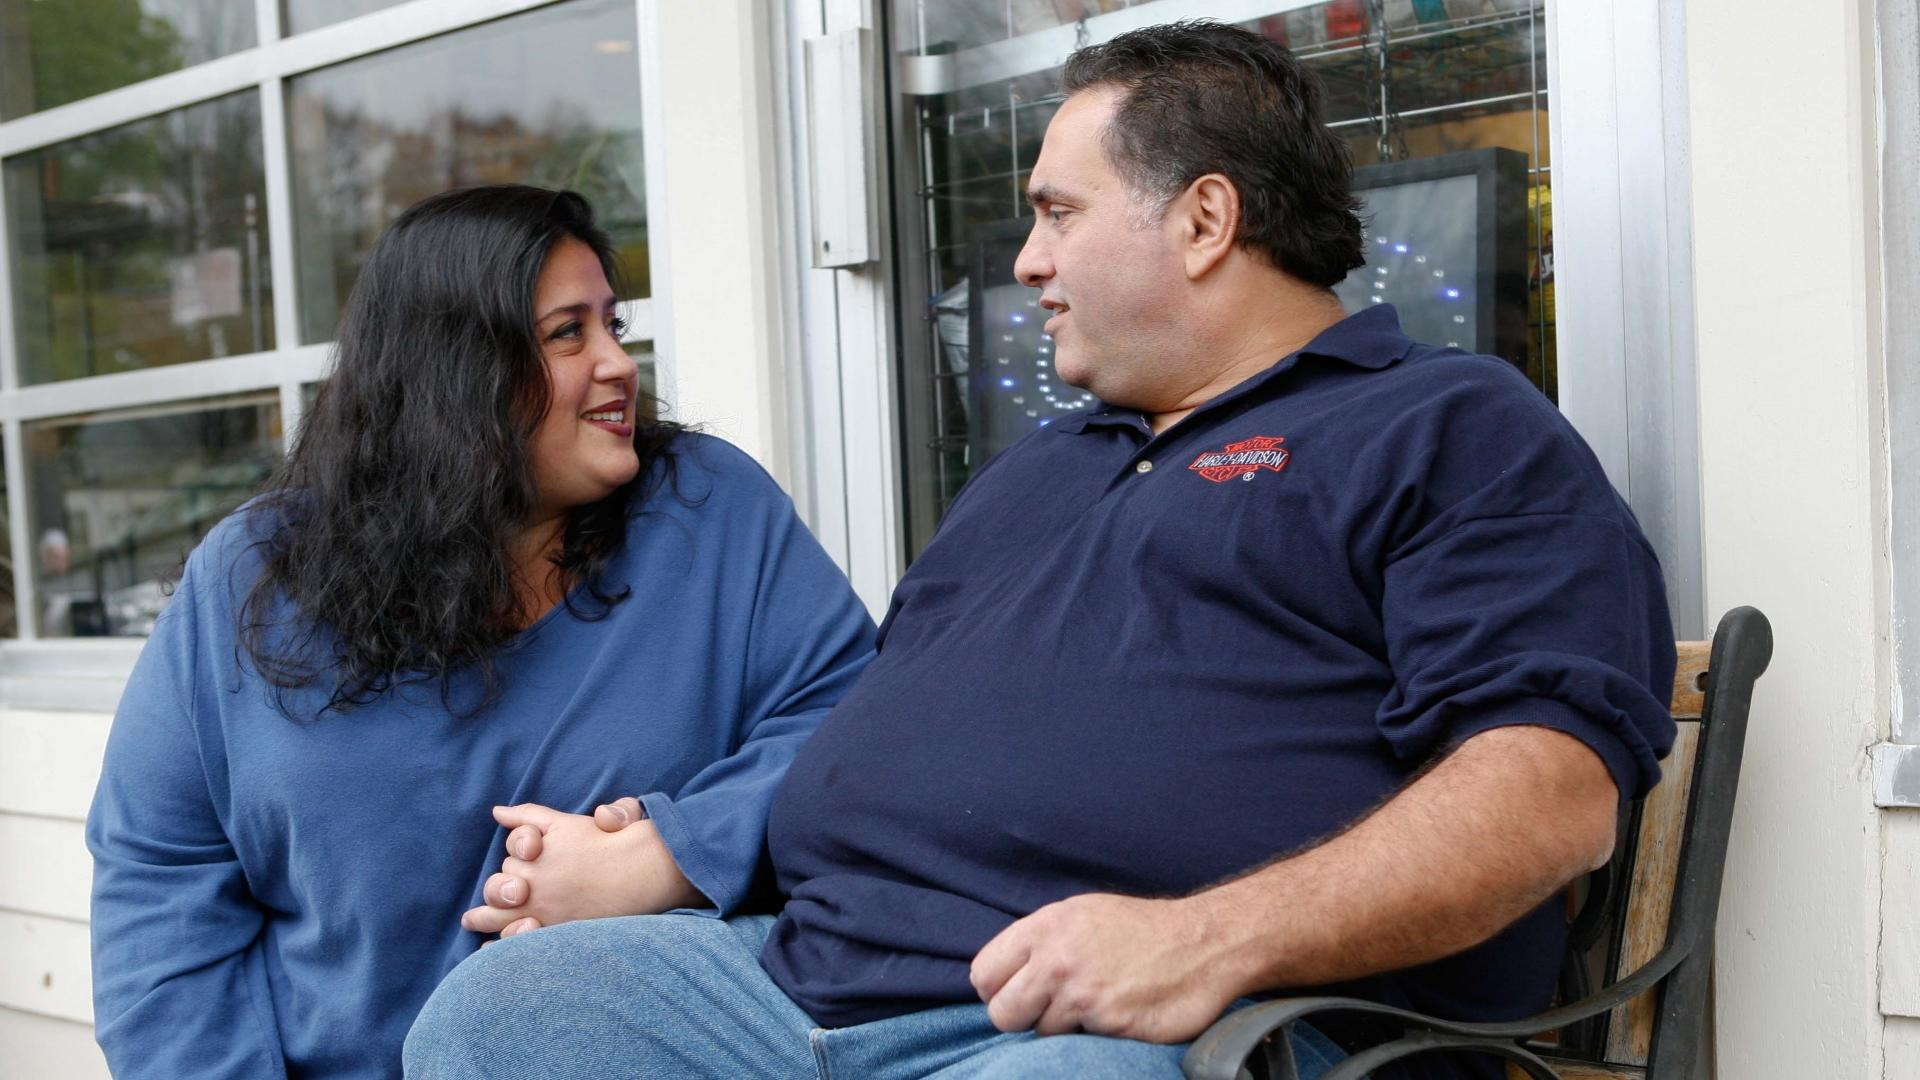 Риск сахарного диабета в супружеских парах - один на двоих